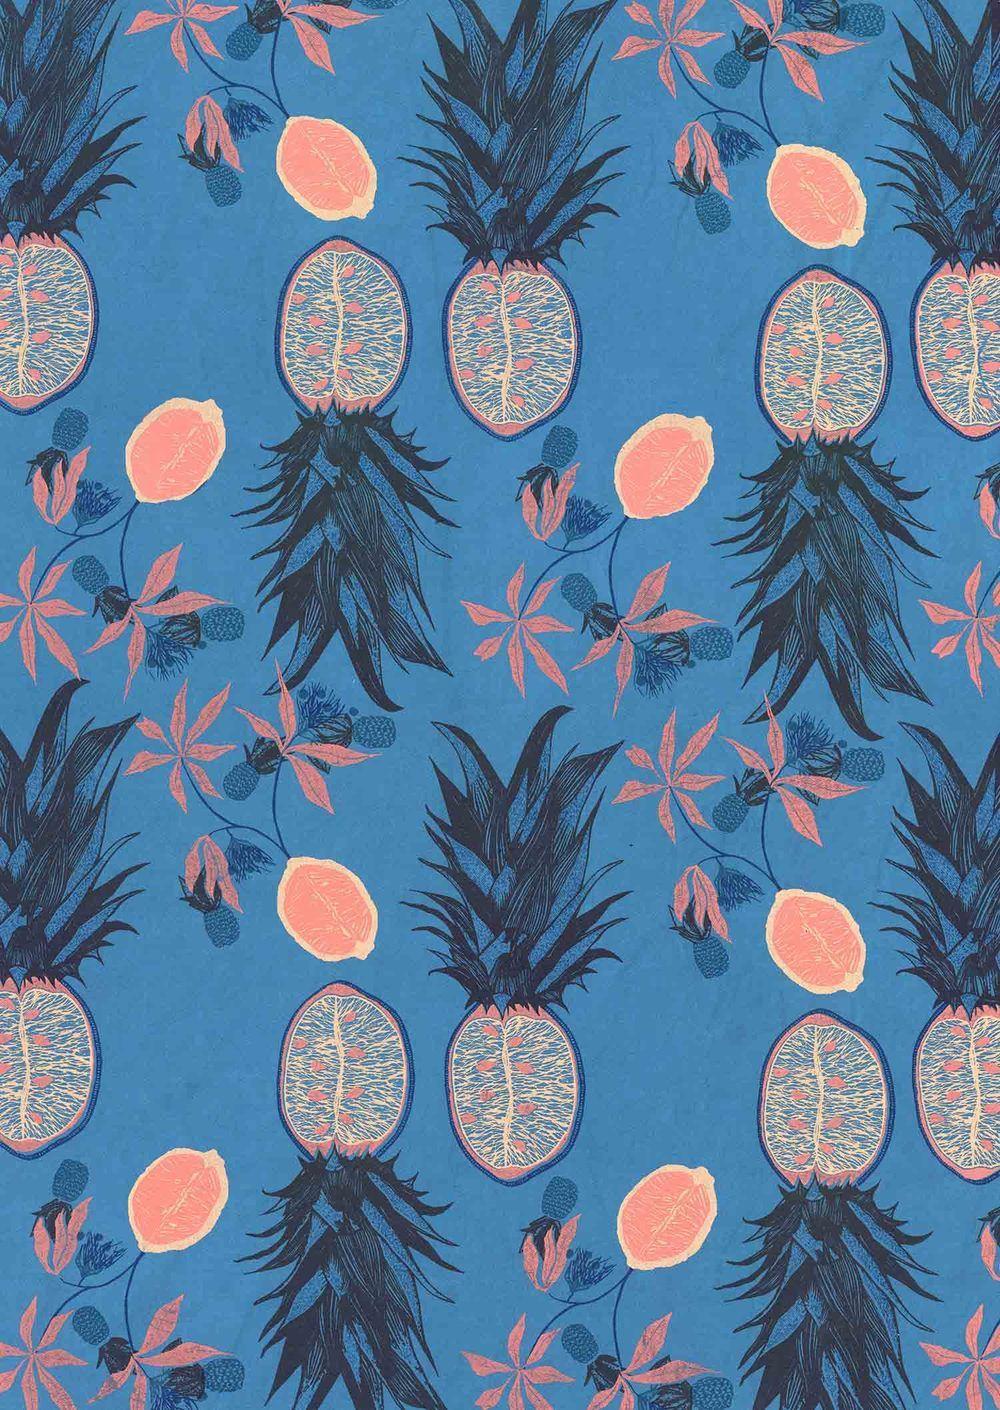 Pineapple Print by Hannah Rampley.